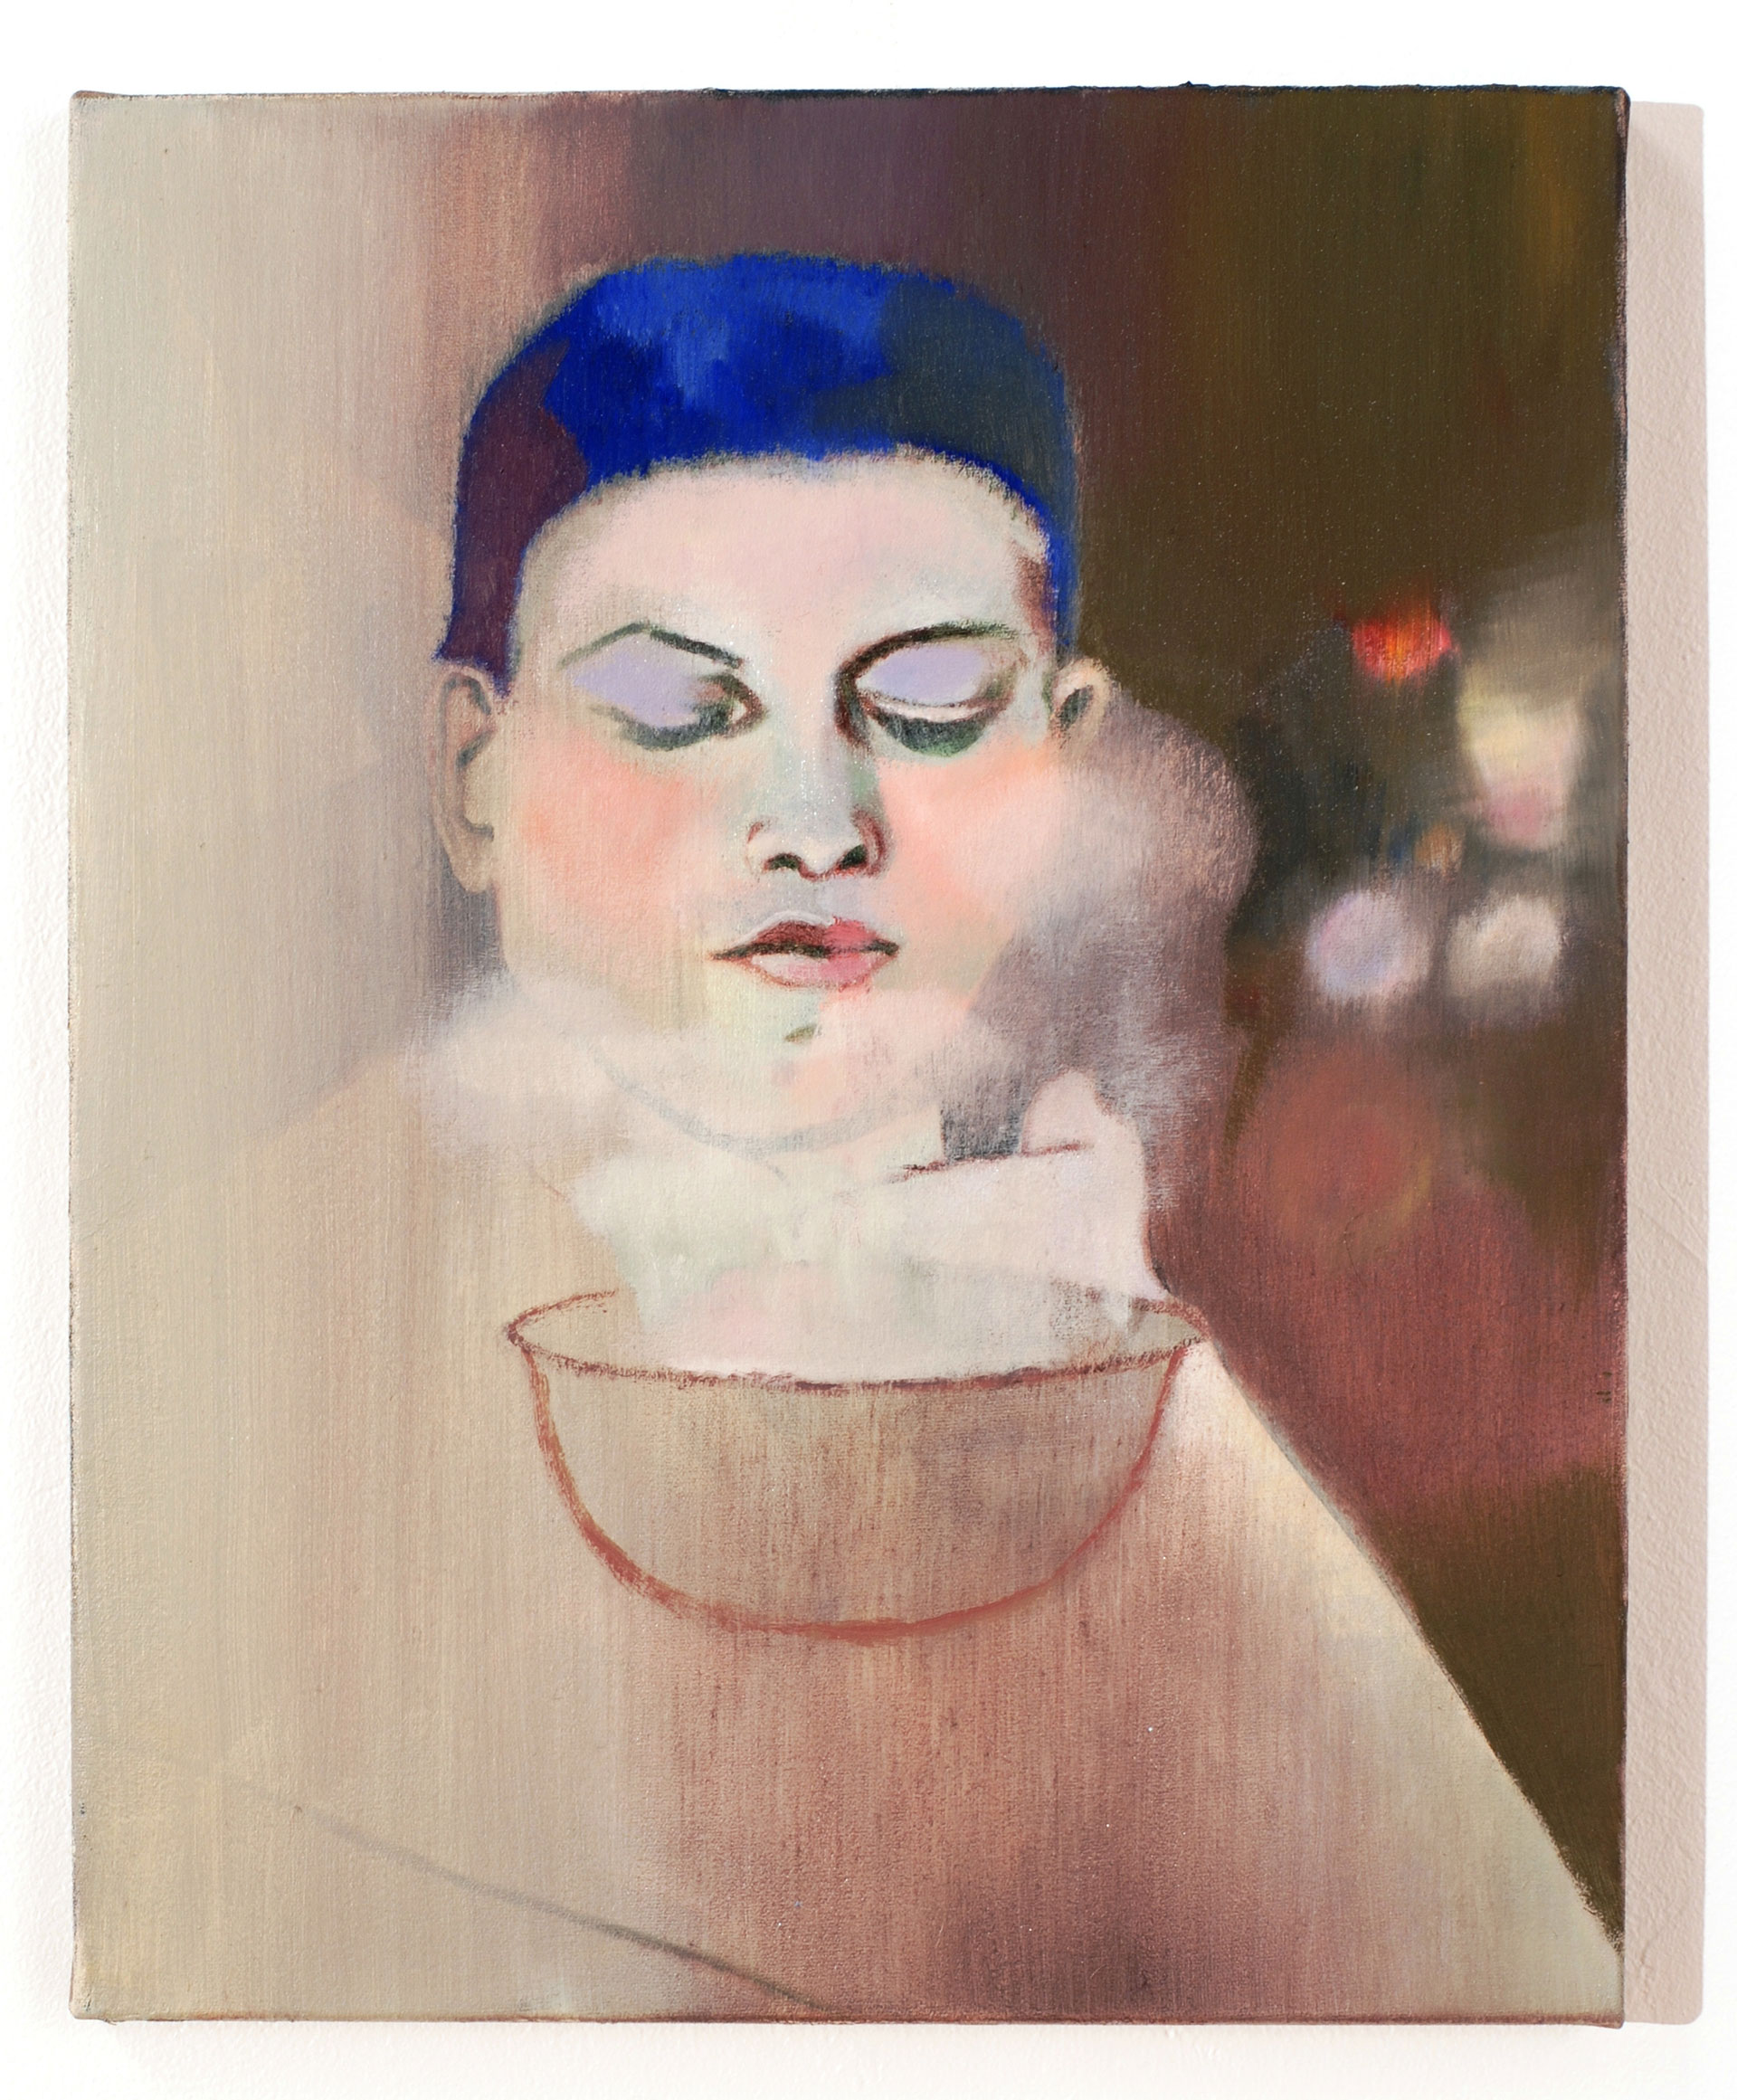 Madeleine Kelly The Boy 2008 Oil on polyester 35 x 28 cm